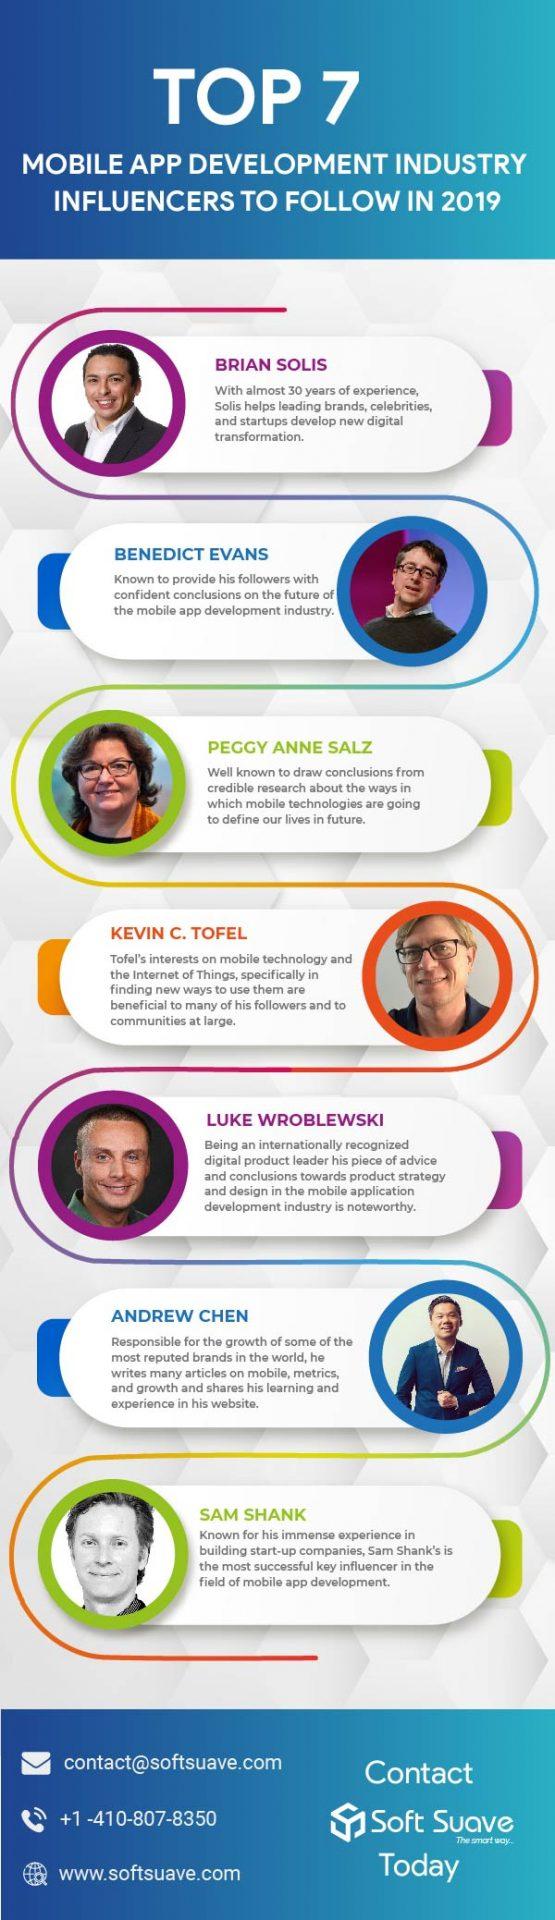 Top Mobile App Development Influencers